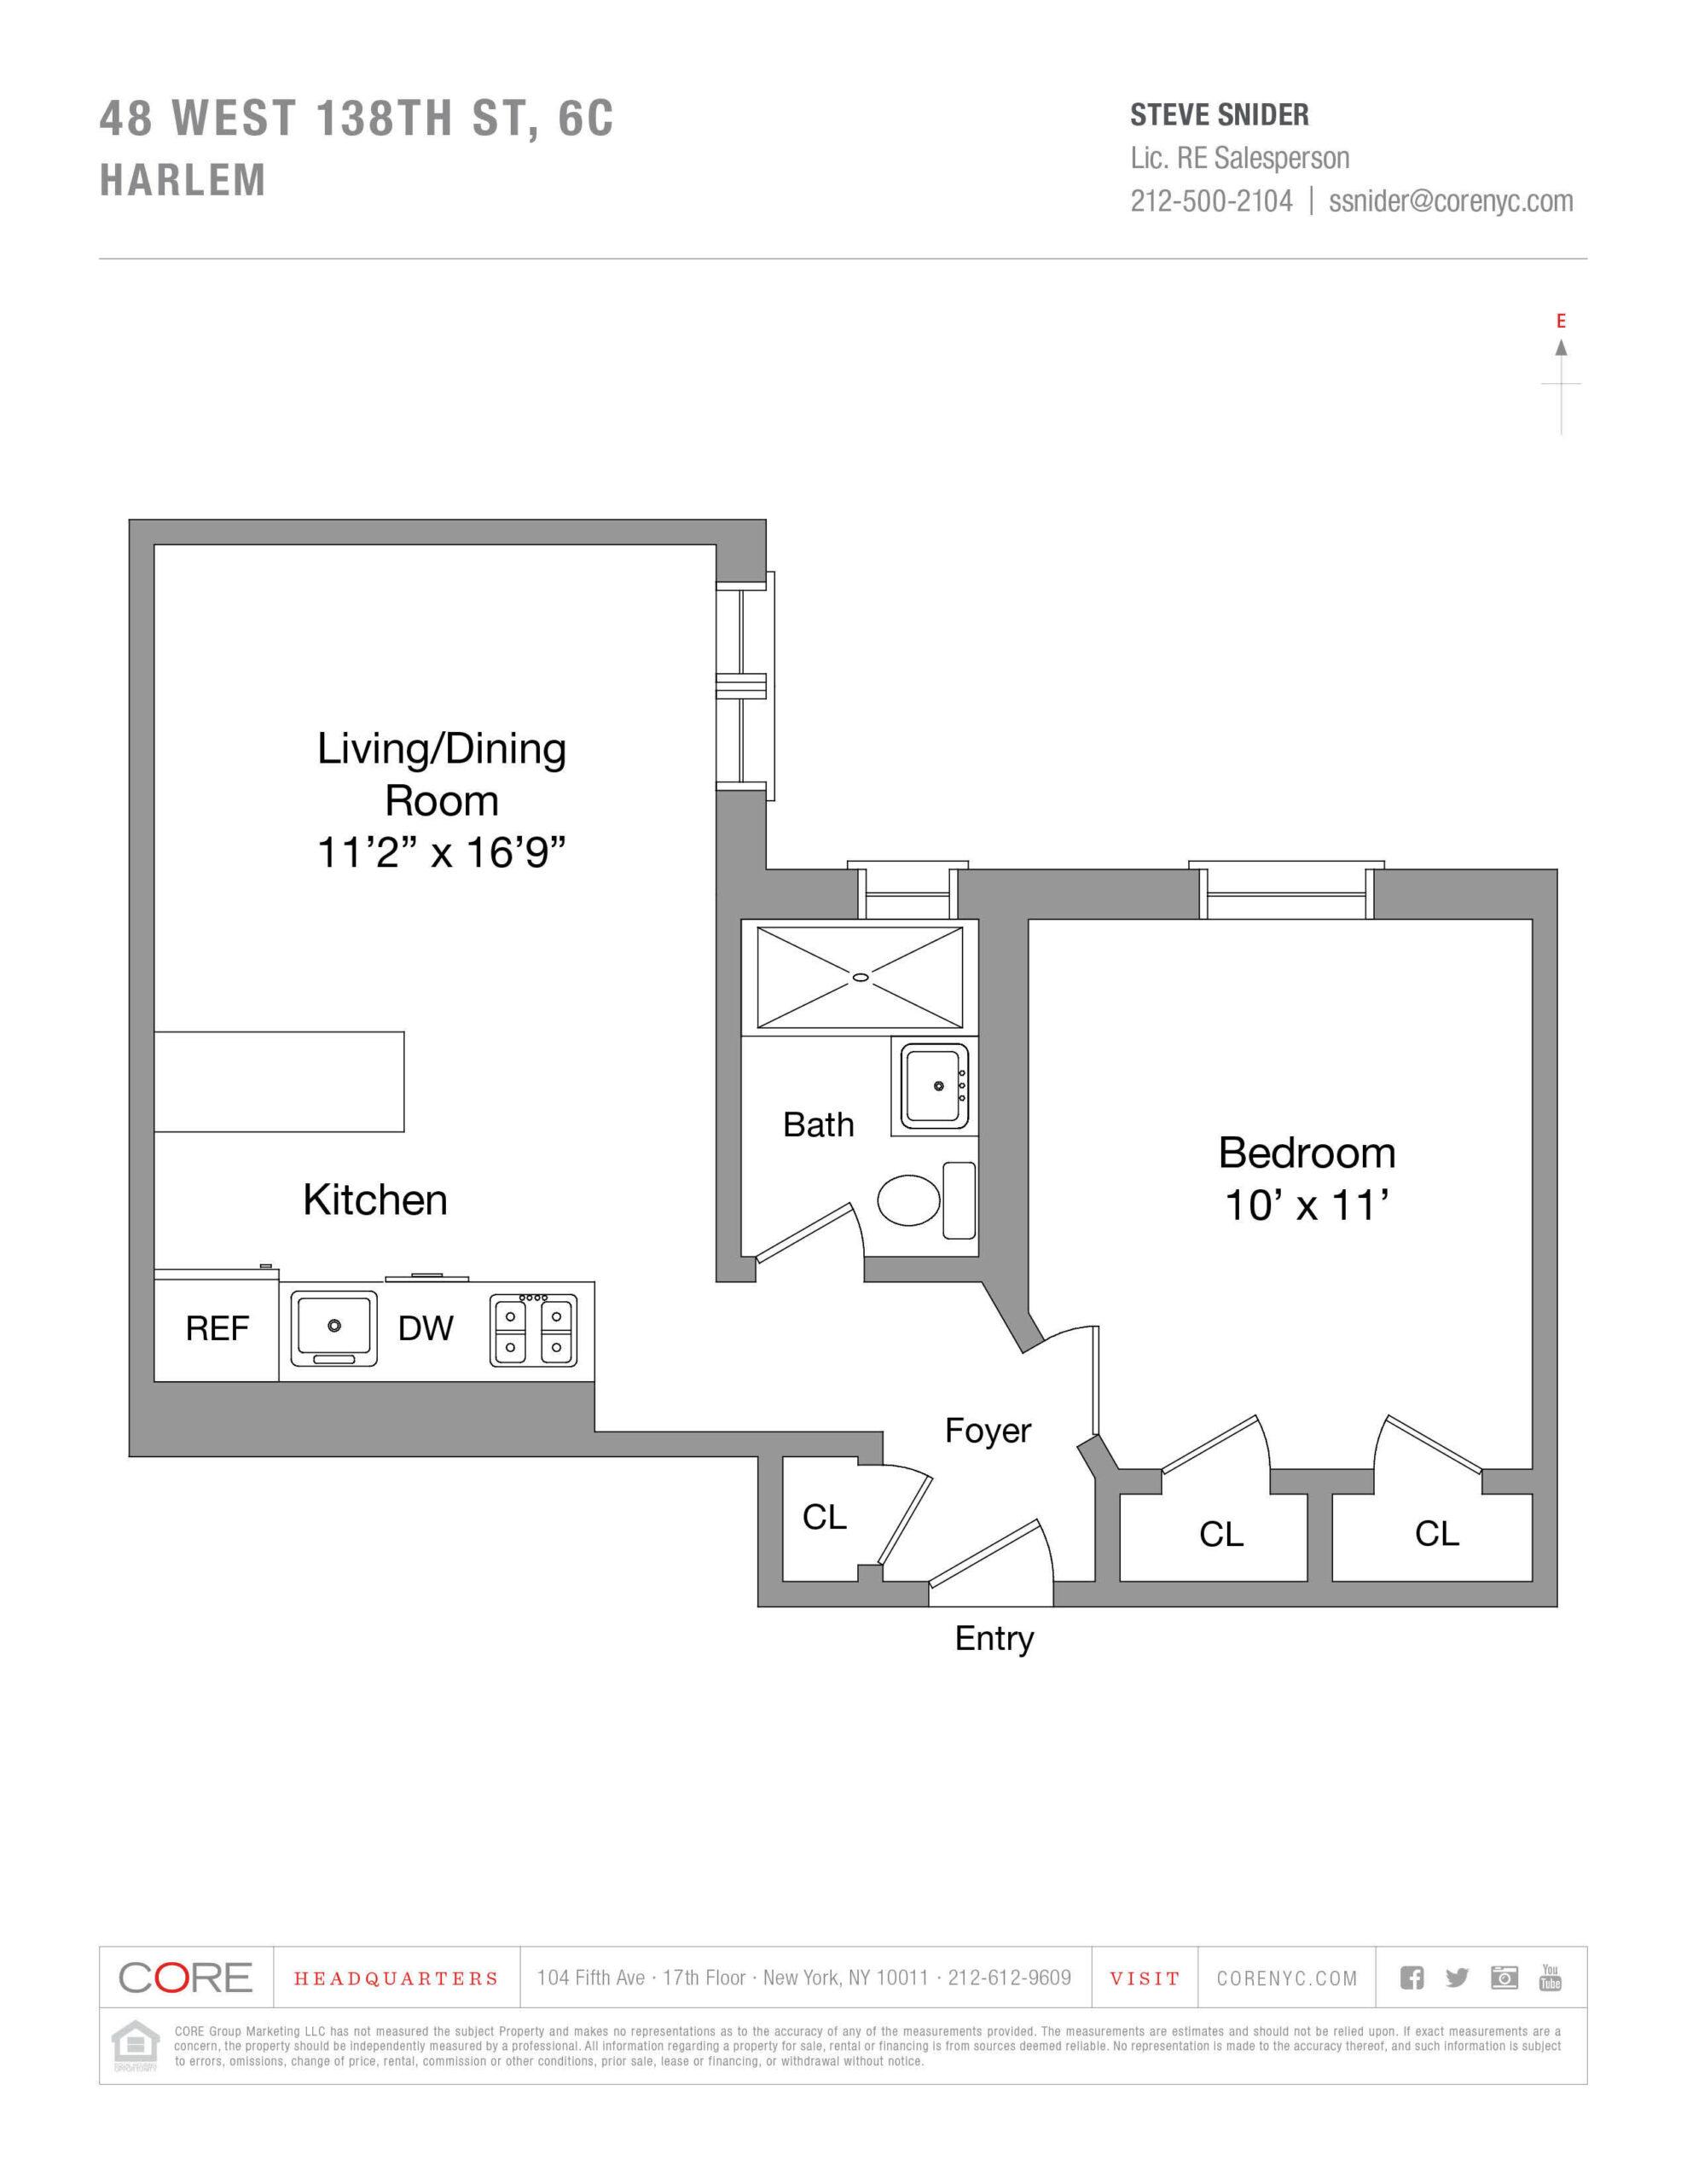 48 West 138th St. SIXC, New York, NY 10037